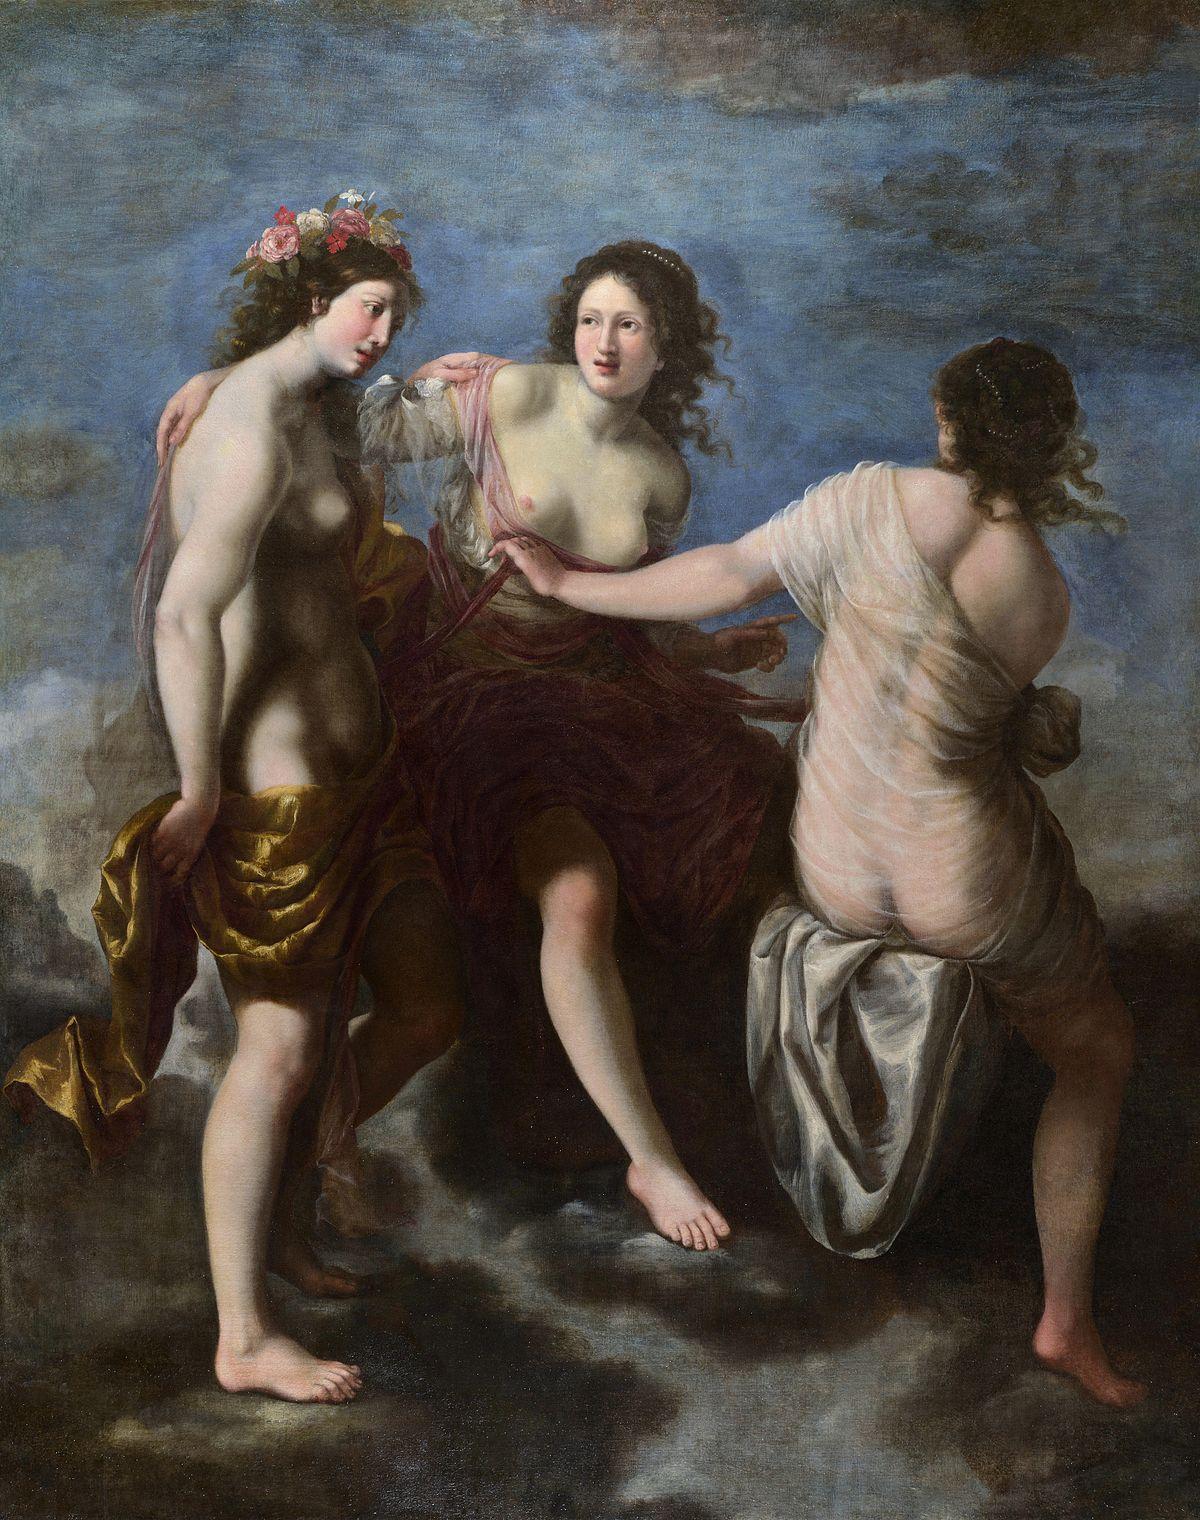 http://upload.wikimedia.org/wikipedia/commons/thumb/d/d5/The_Three_Graces_by_Francesco_Furini_%281638%29.jpg/1200px-The_Three_Graces_by_Francesco_Furini_%281638%29.jpg